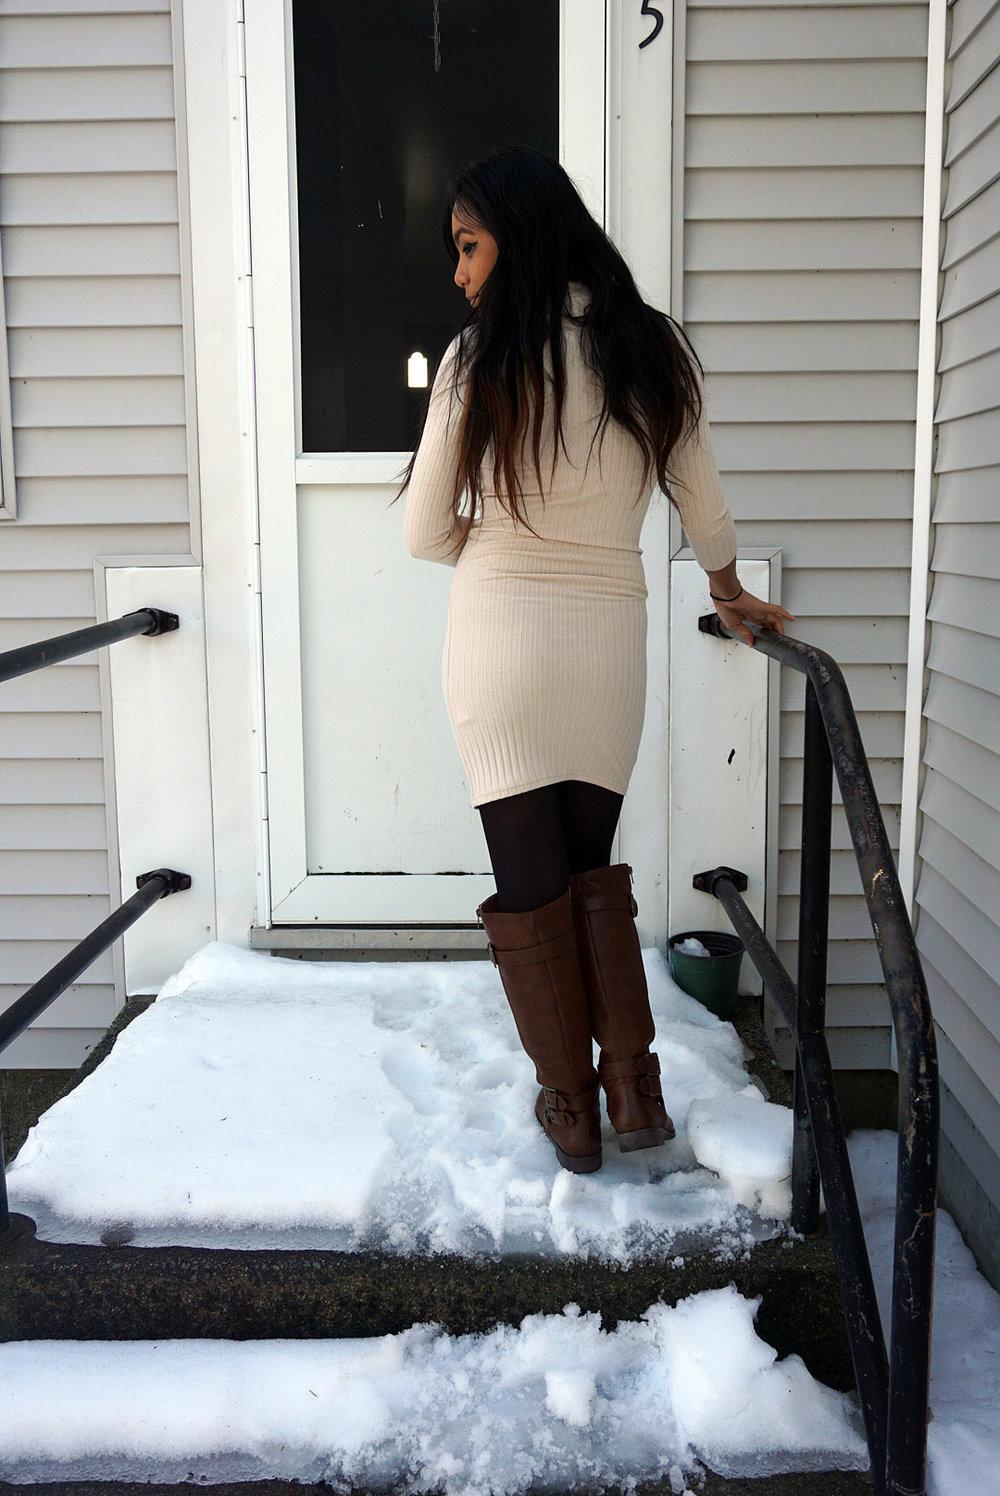 White-Dress-Caramel-Cardigan-Transitioning-To-Spring-Fashionista-Blogger-Style-LINDATENCHITRAN-7-1080x1616.jpg